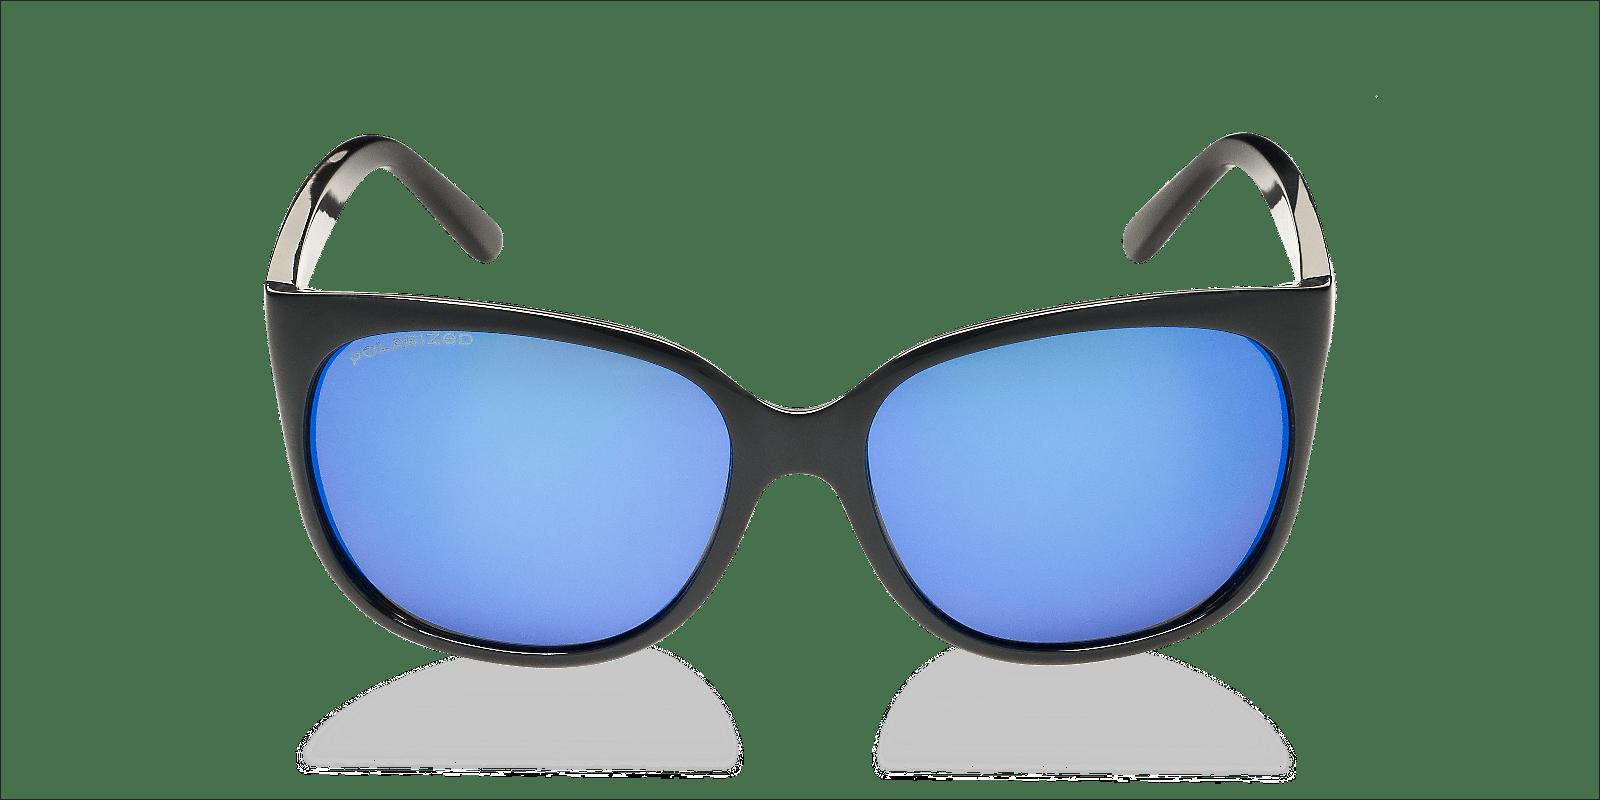 Sunglasses closeup transparent png. Clipart glasses chasma